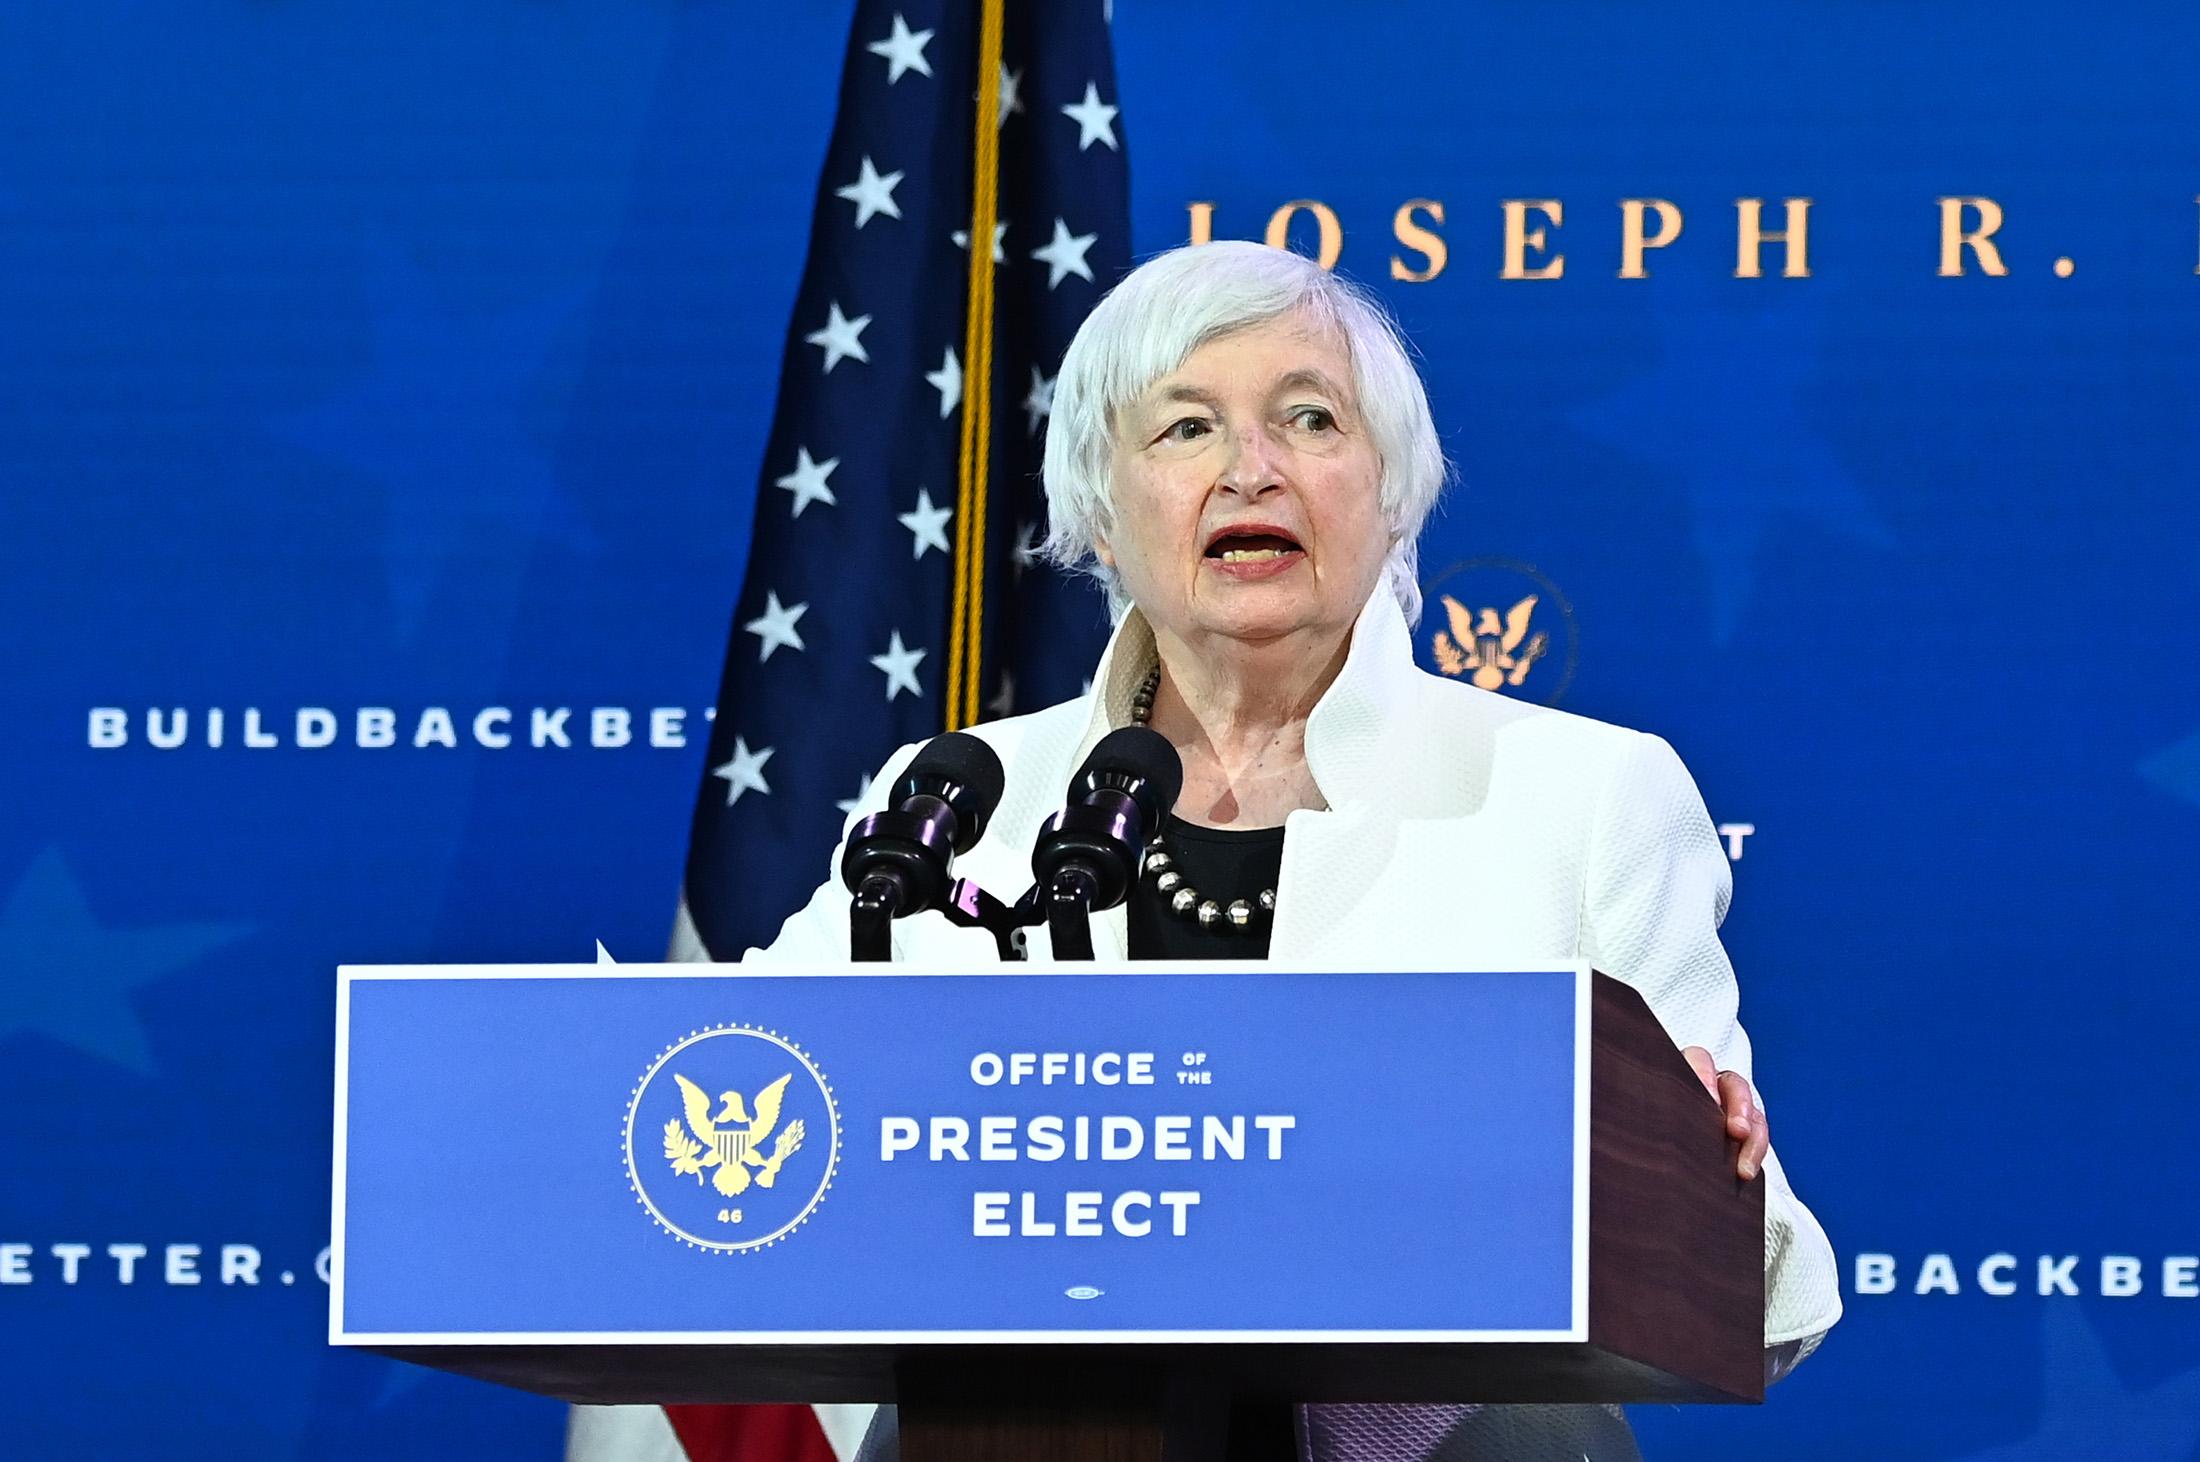 Treasury secretary nominee Janet Yellen speaks after U.S. President-elect Joe Biden announced his economic team at The Queen Theater in Wilmington, Delaware, on December 1.